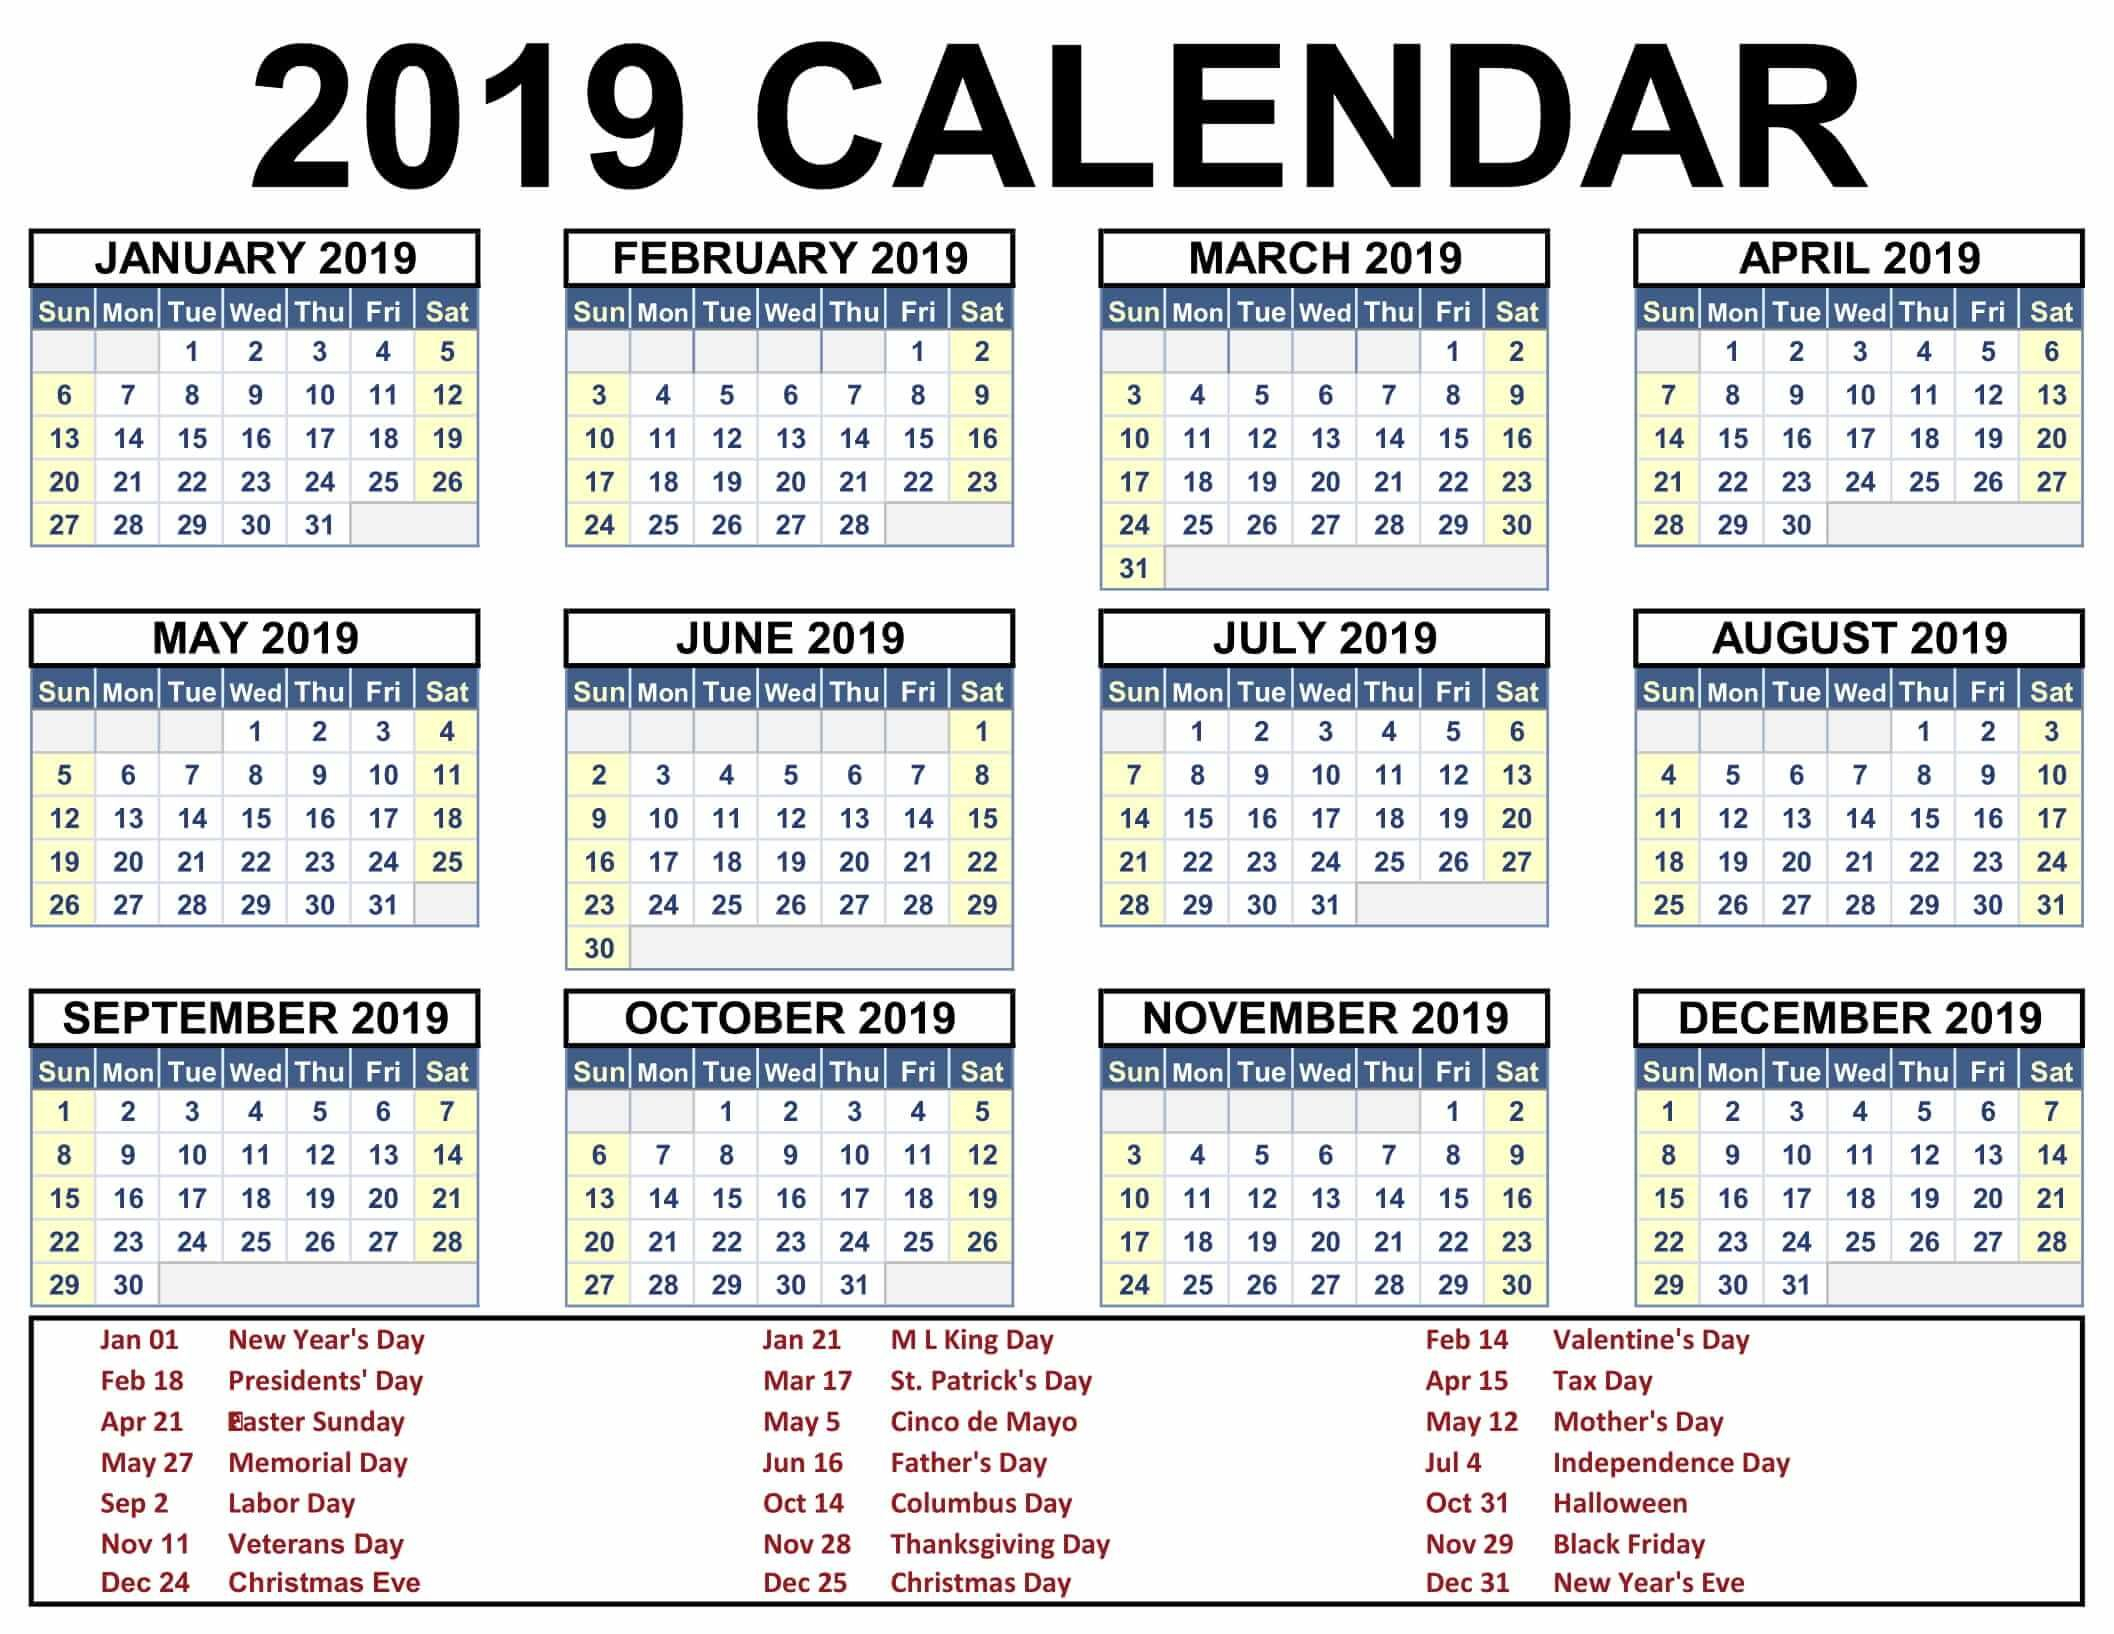 2019 Calendar With Holidays Printable #2019Calendar intended for Free Printable Event Calendar Template